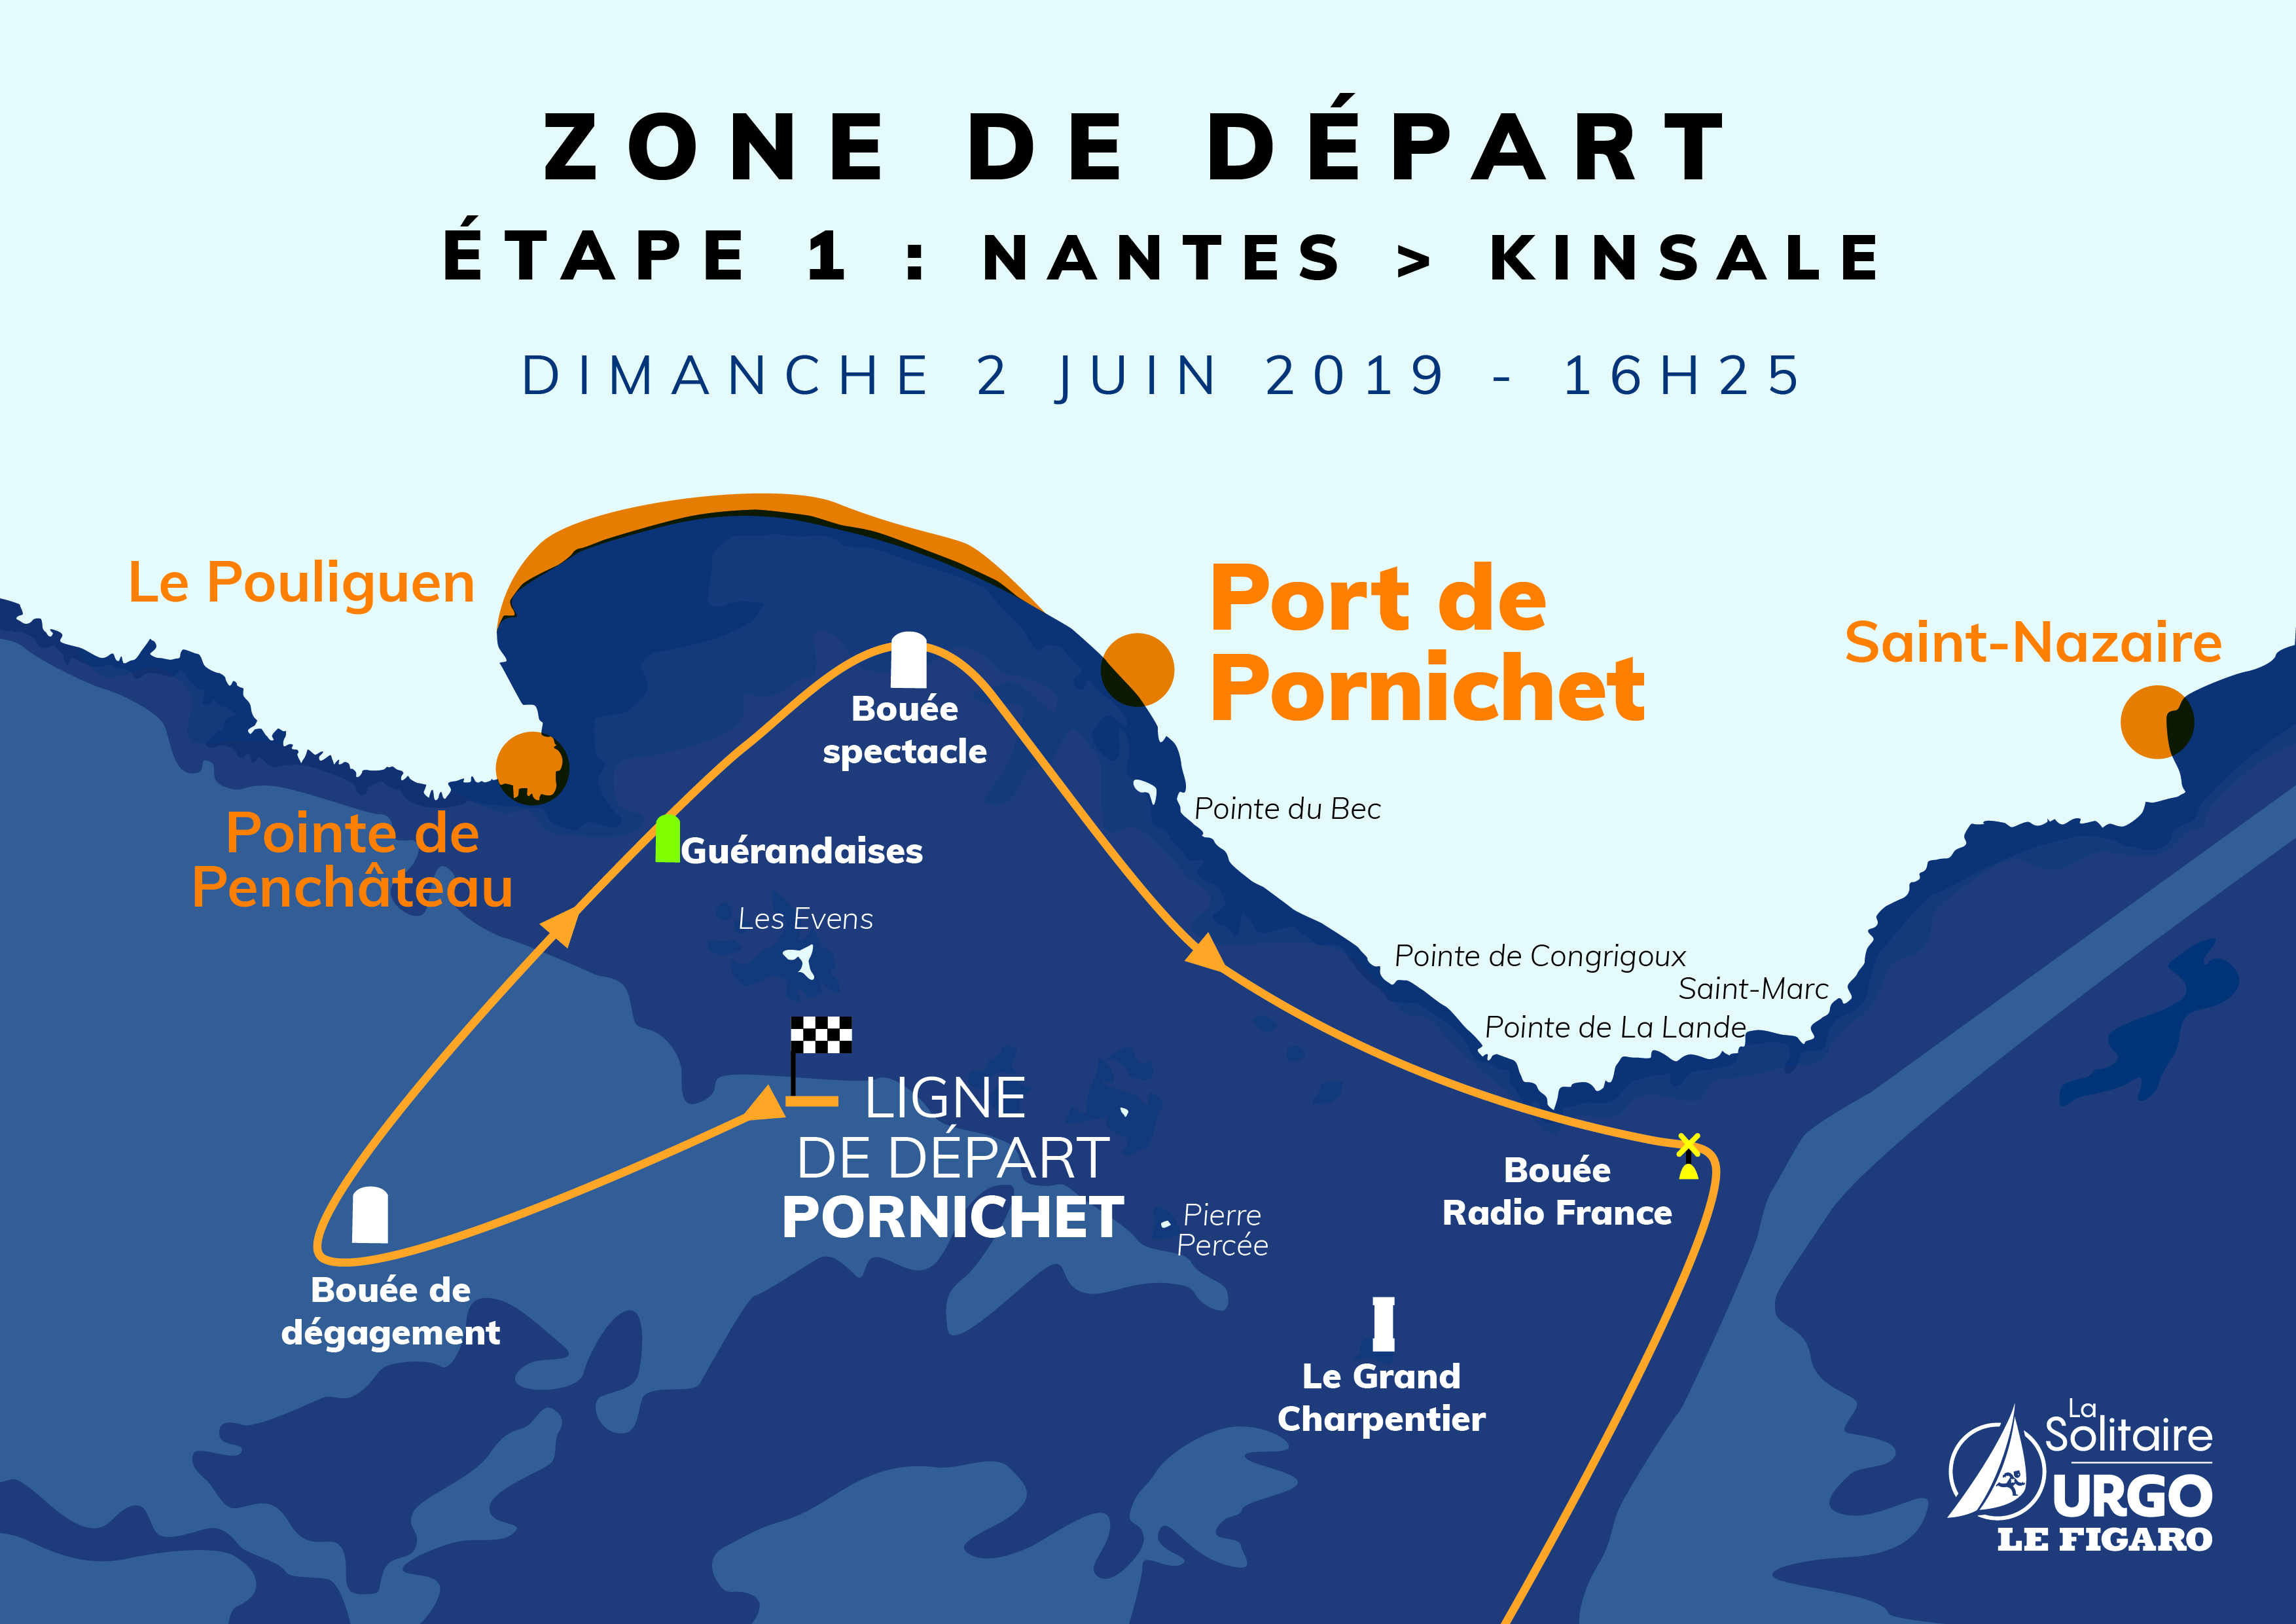 Parcours_depart-nantes.jpg